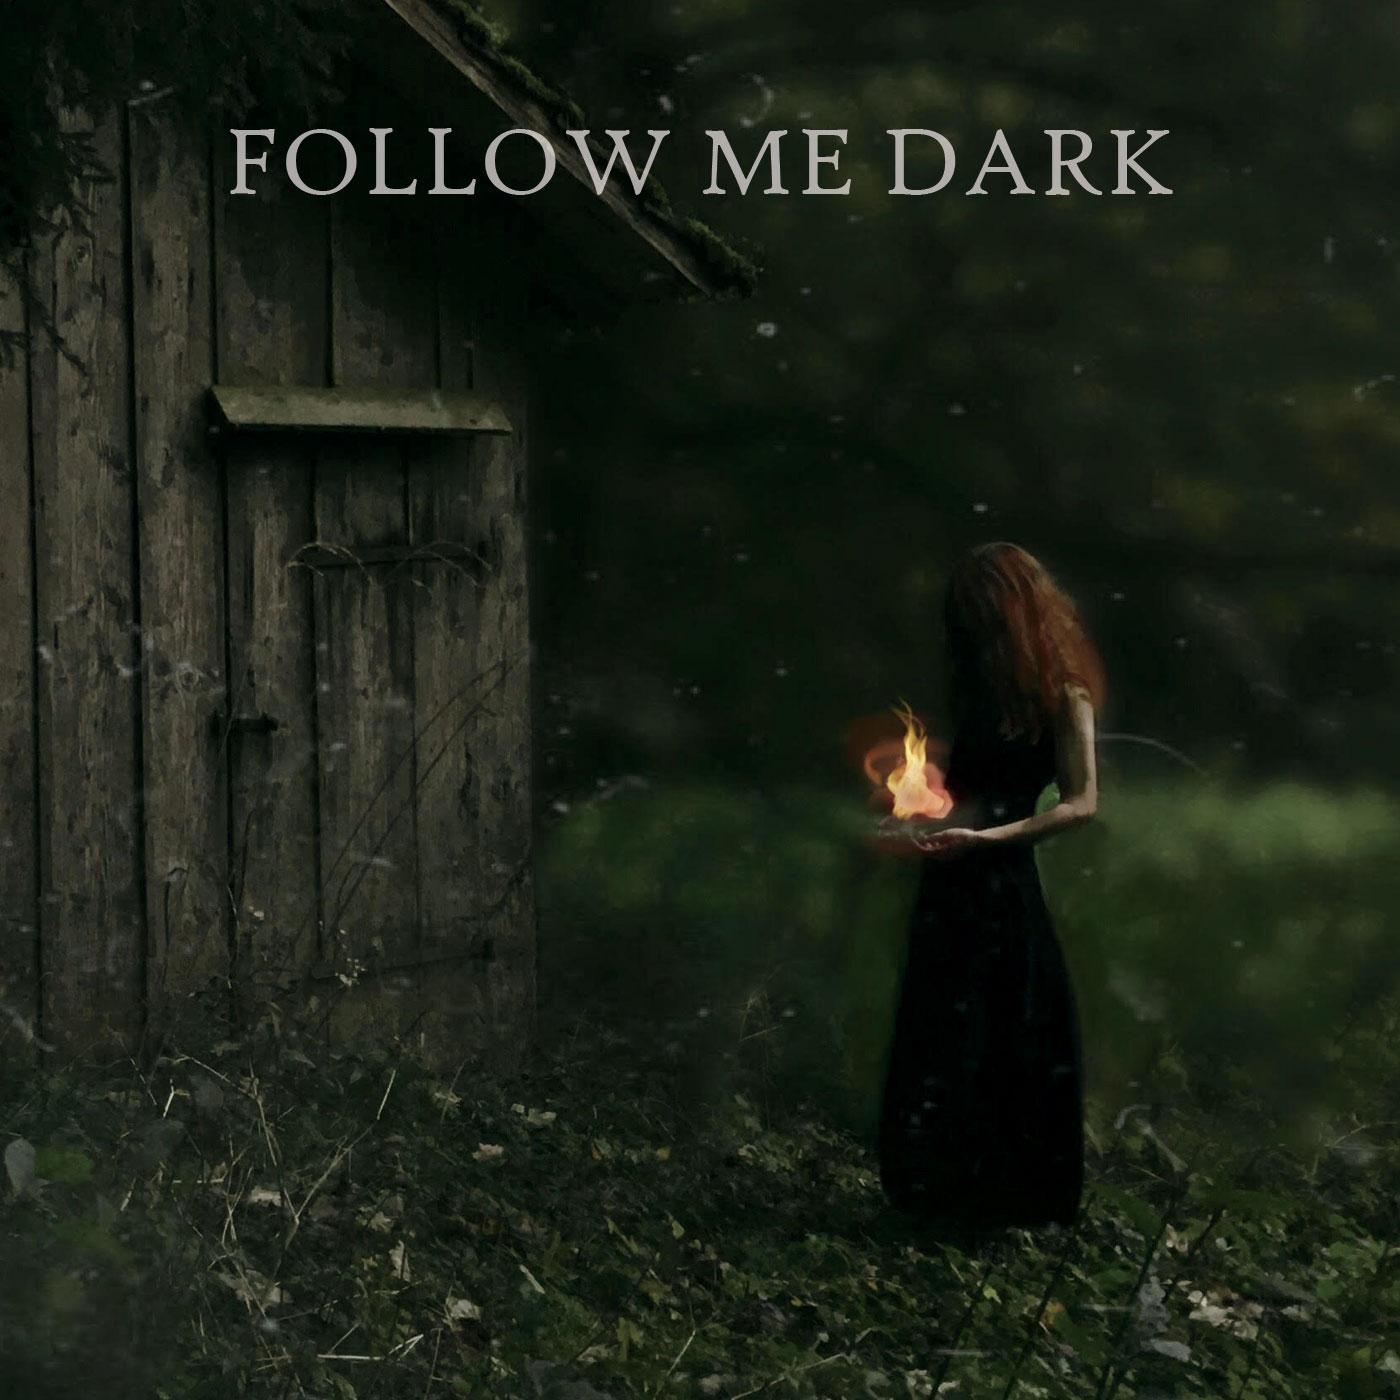 Follow me dark The Hollywood Tribune